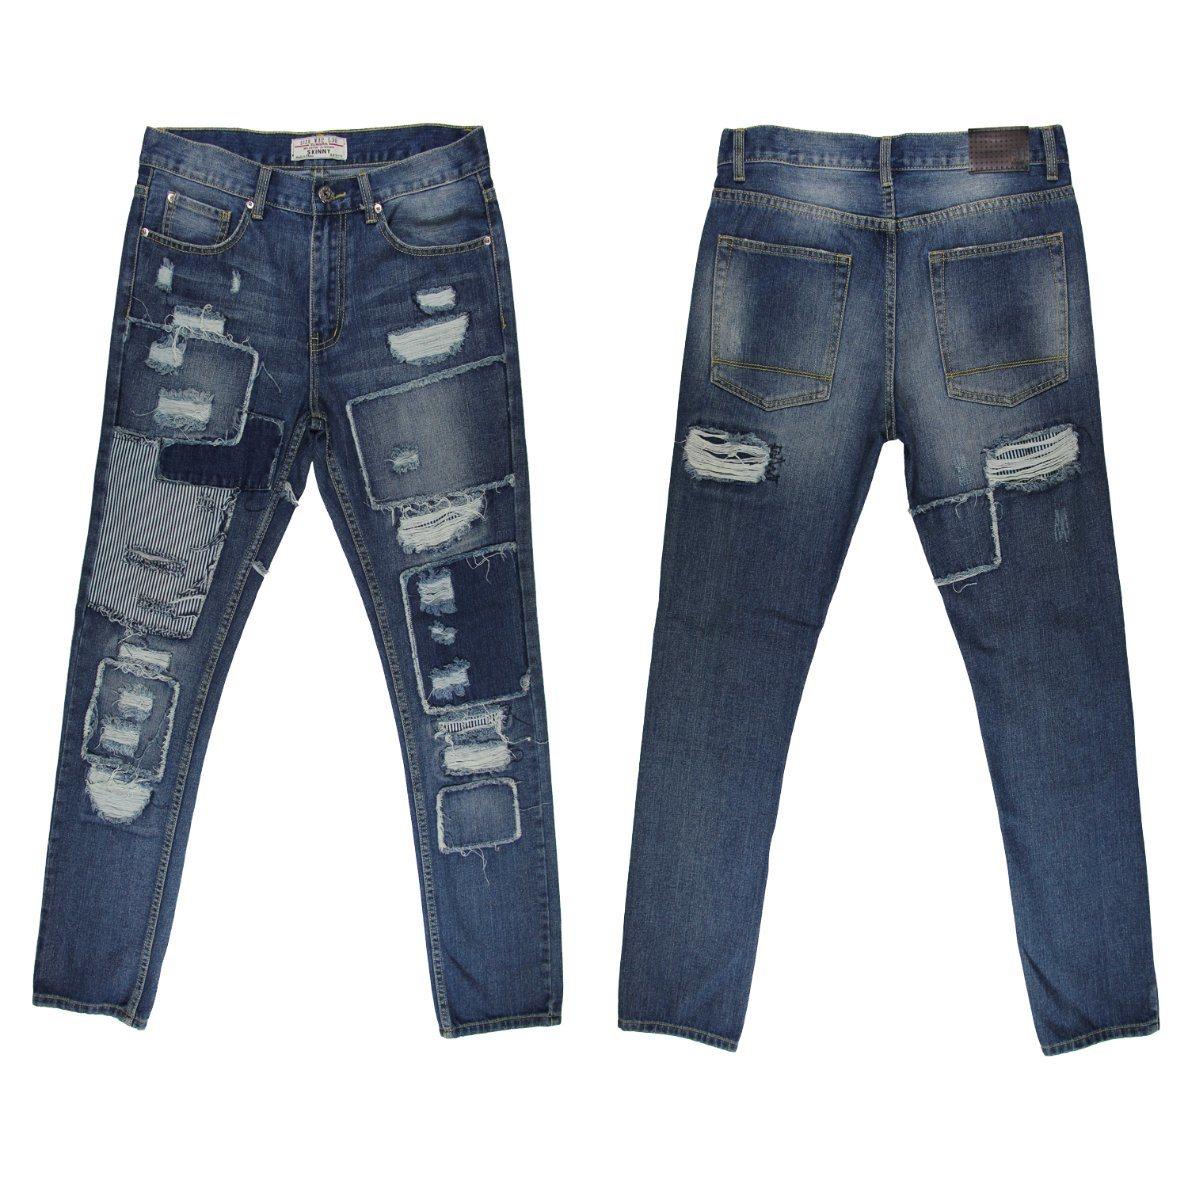 Factory 2017 Men′s Straight Denim Jeans (MYX022)